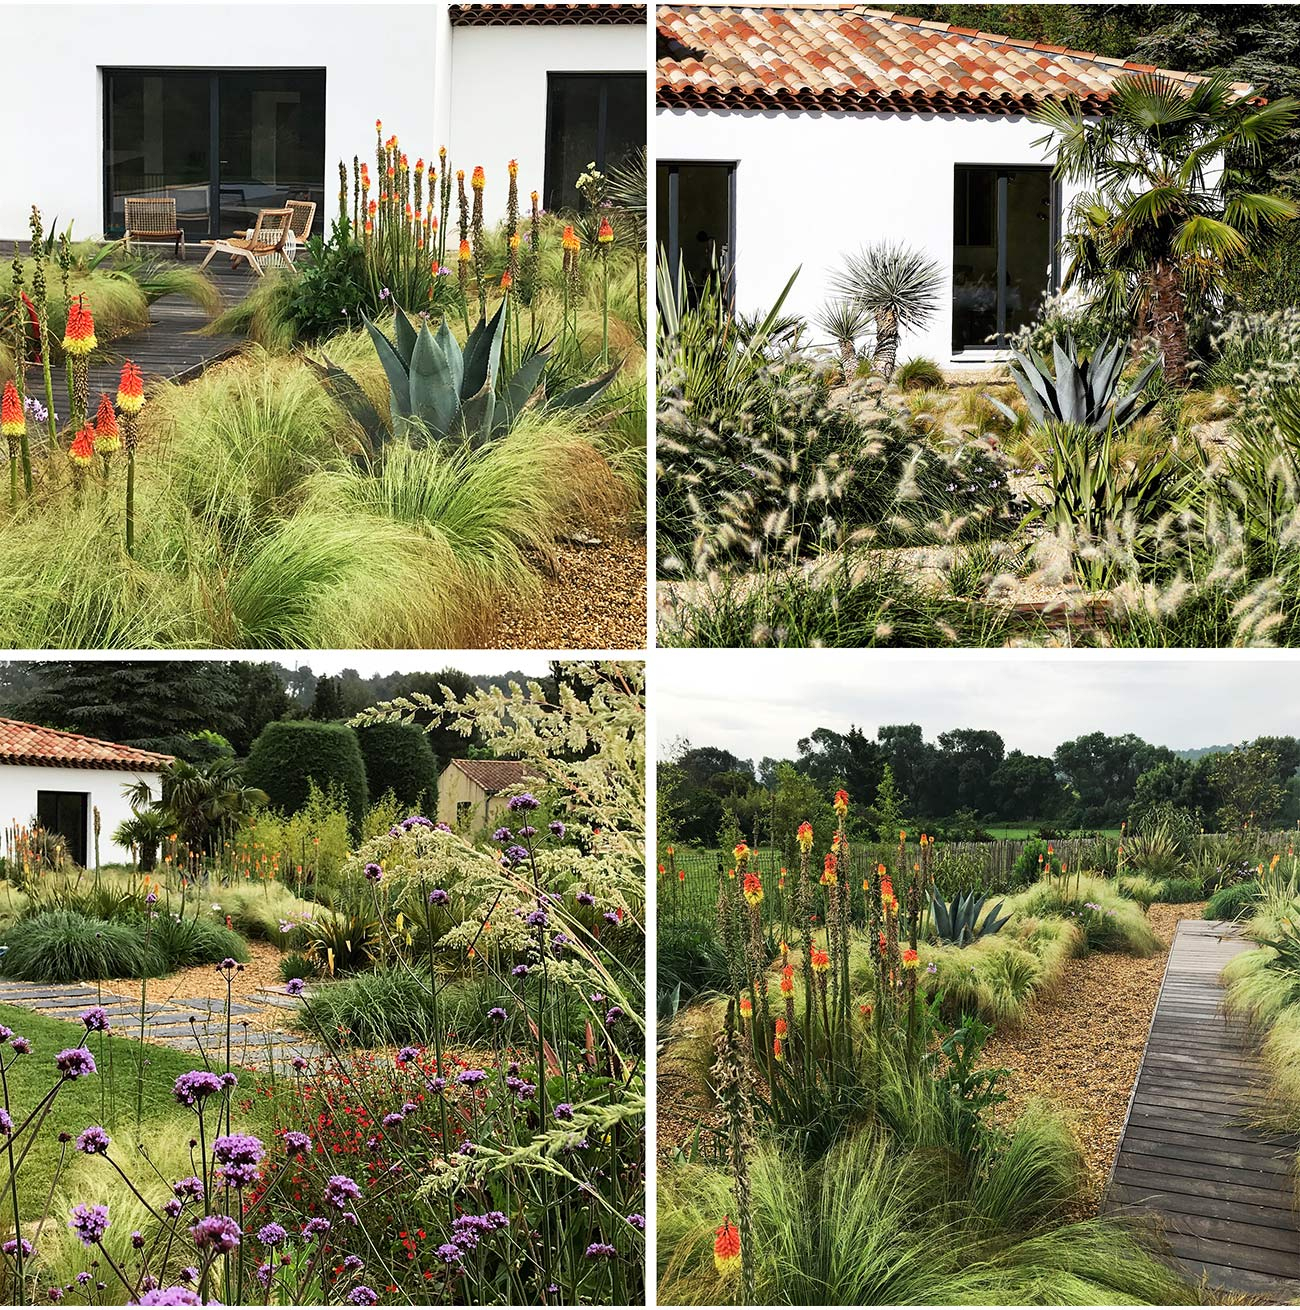 Jardin Méditerranéen - Paysagiste Montpellier & Aix-En-Provence destiné Exemple De Jardin Méditerranéen